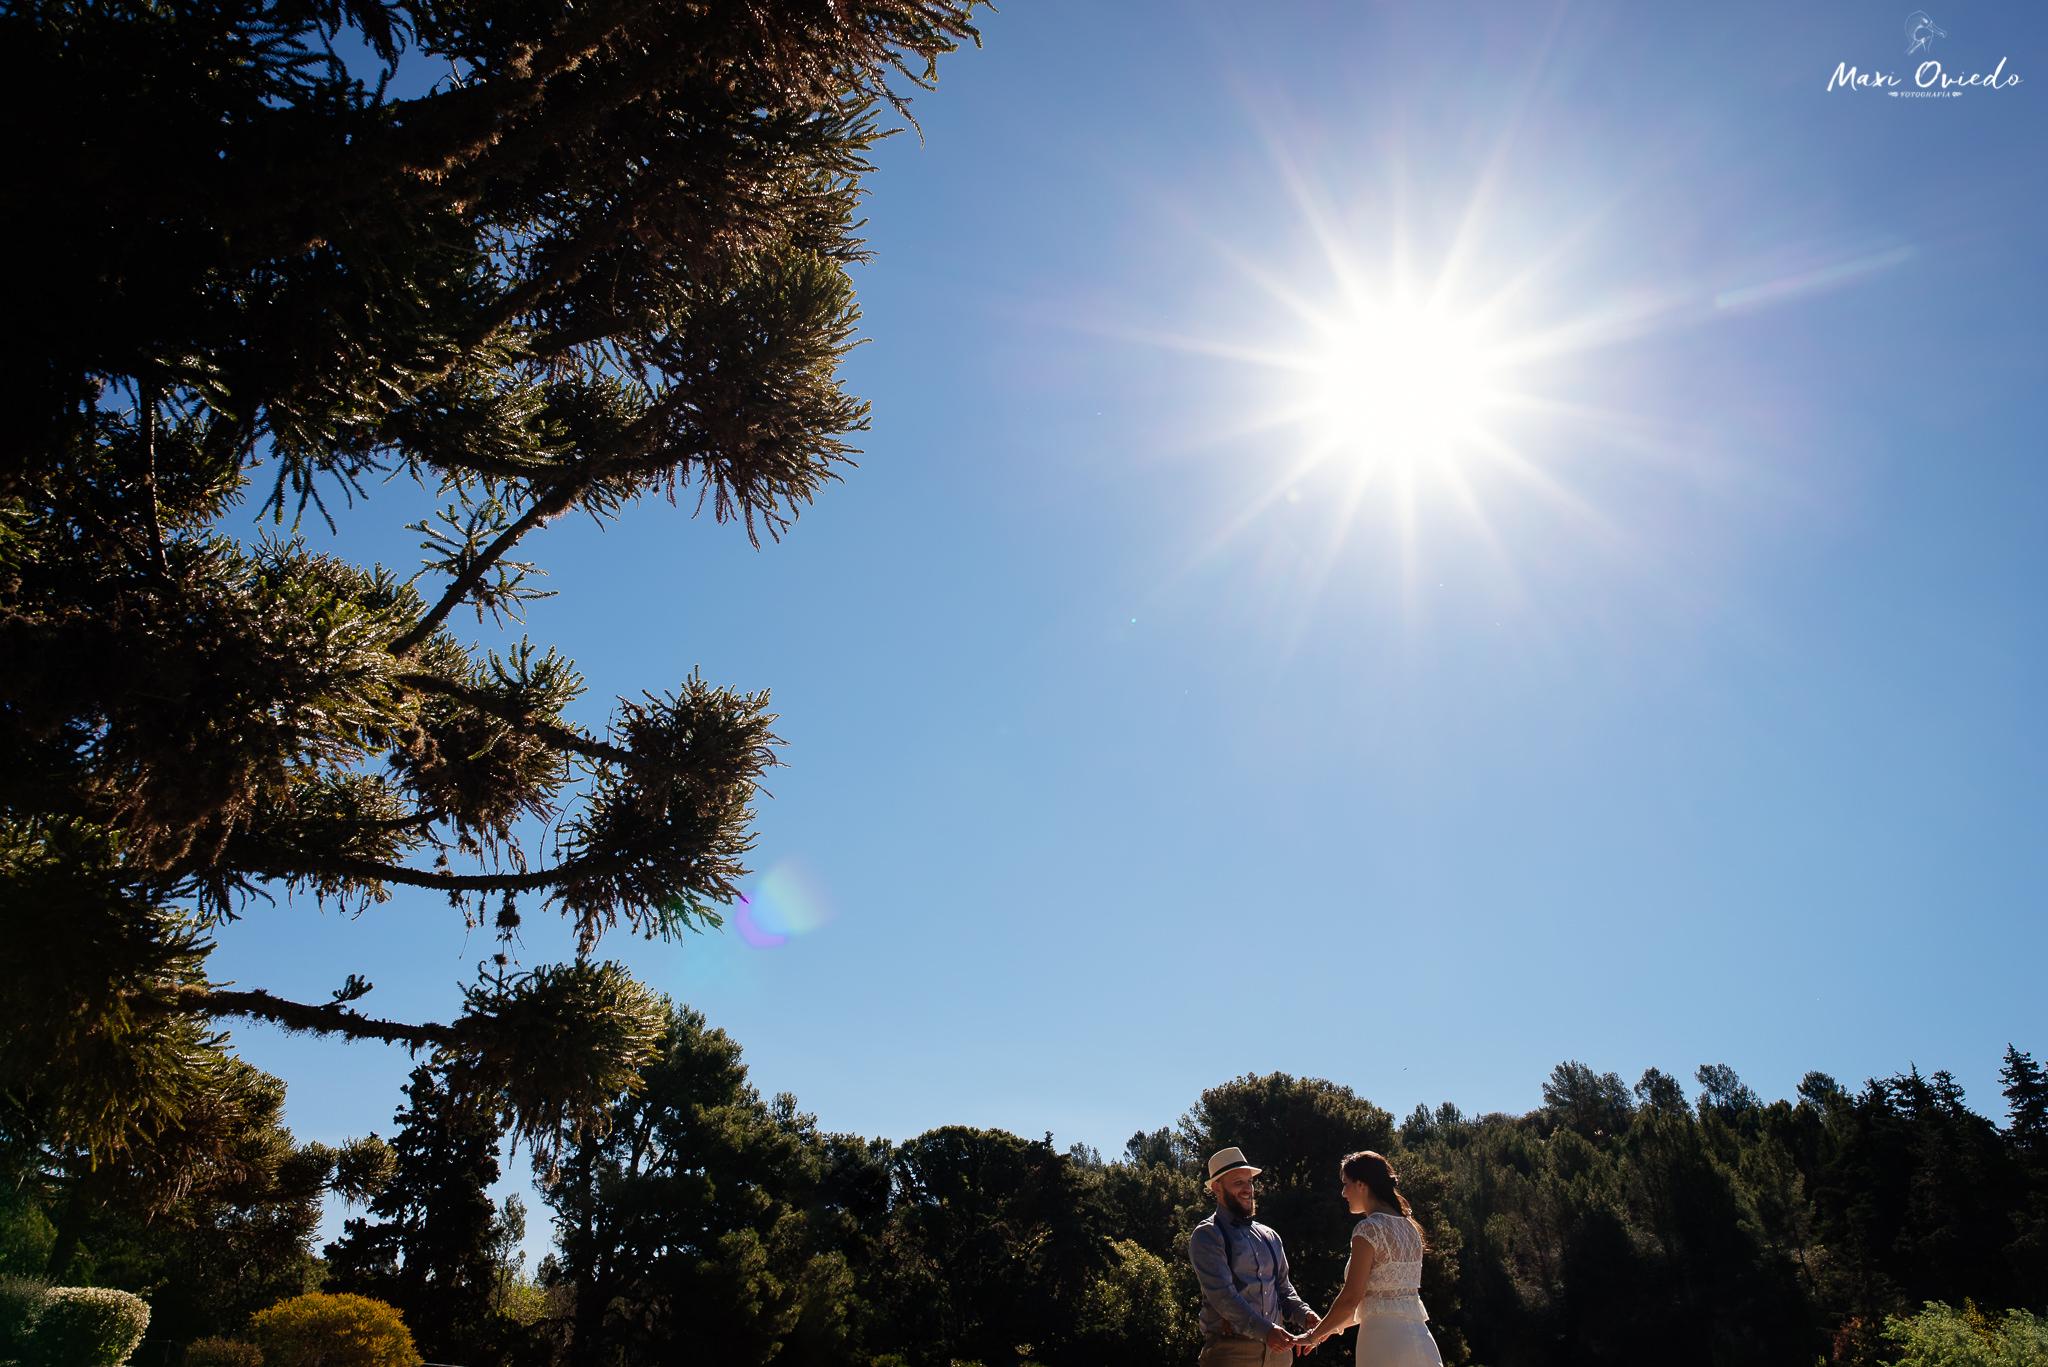 boda sextuple la cumbre cordoba cuchi corral fotografo de bodas fotografo de casamientos rosario san nicolas argentina vestido de novia ramo de novia-7.jpg